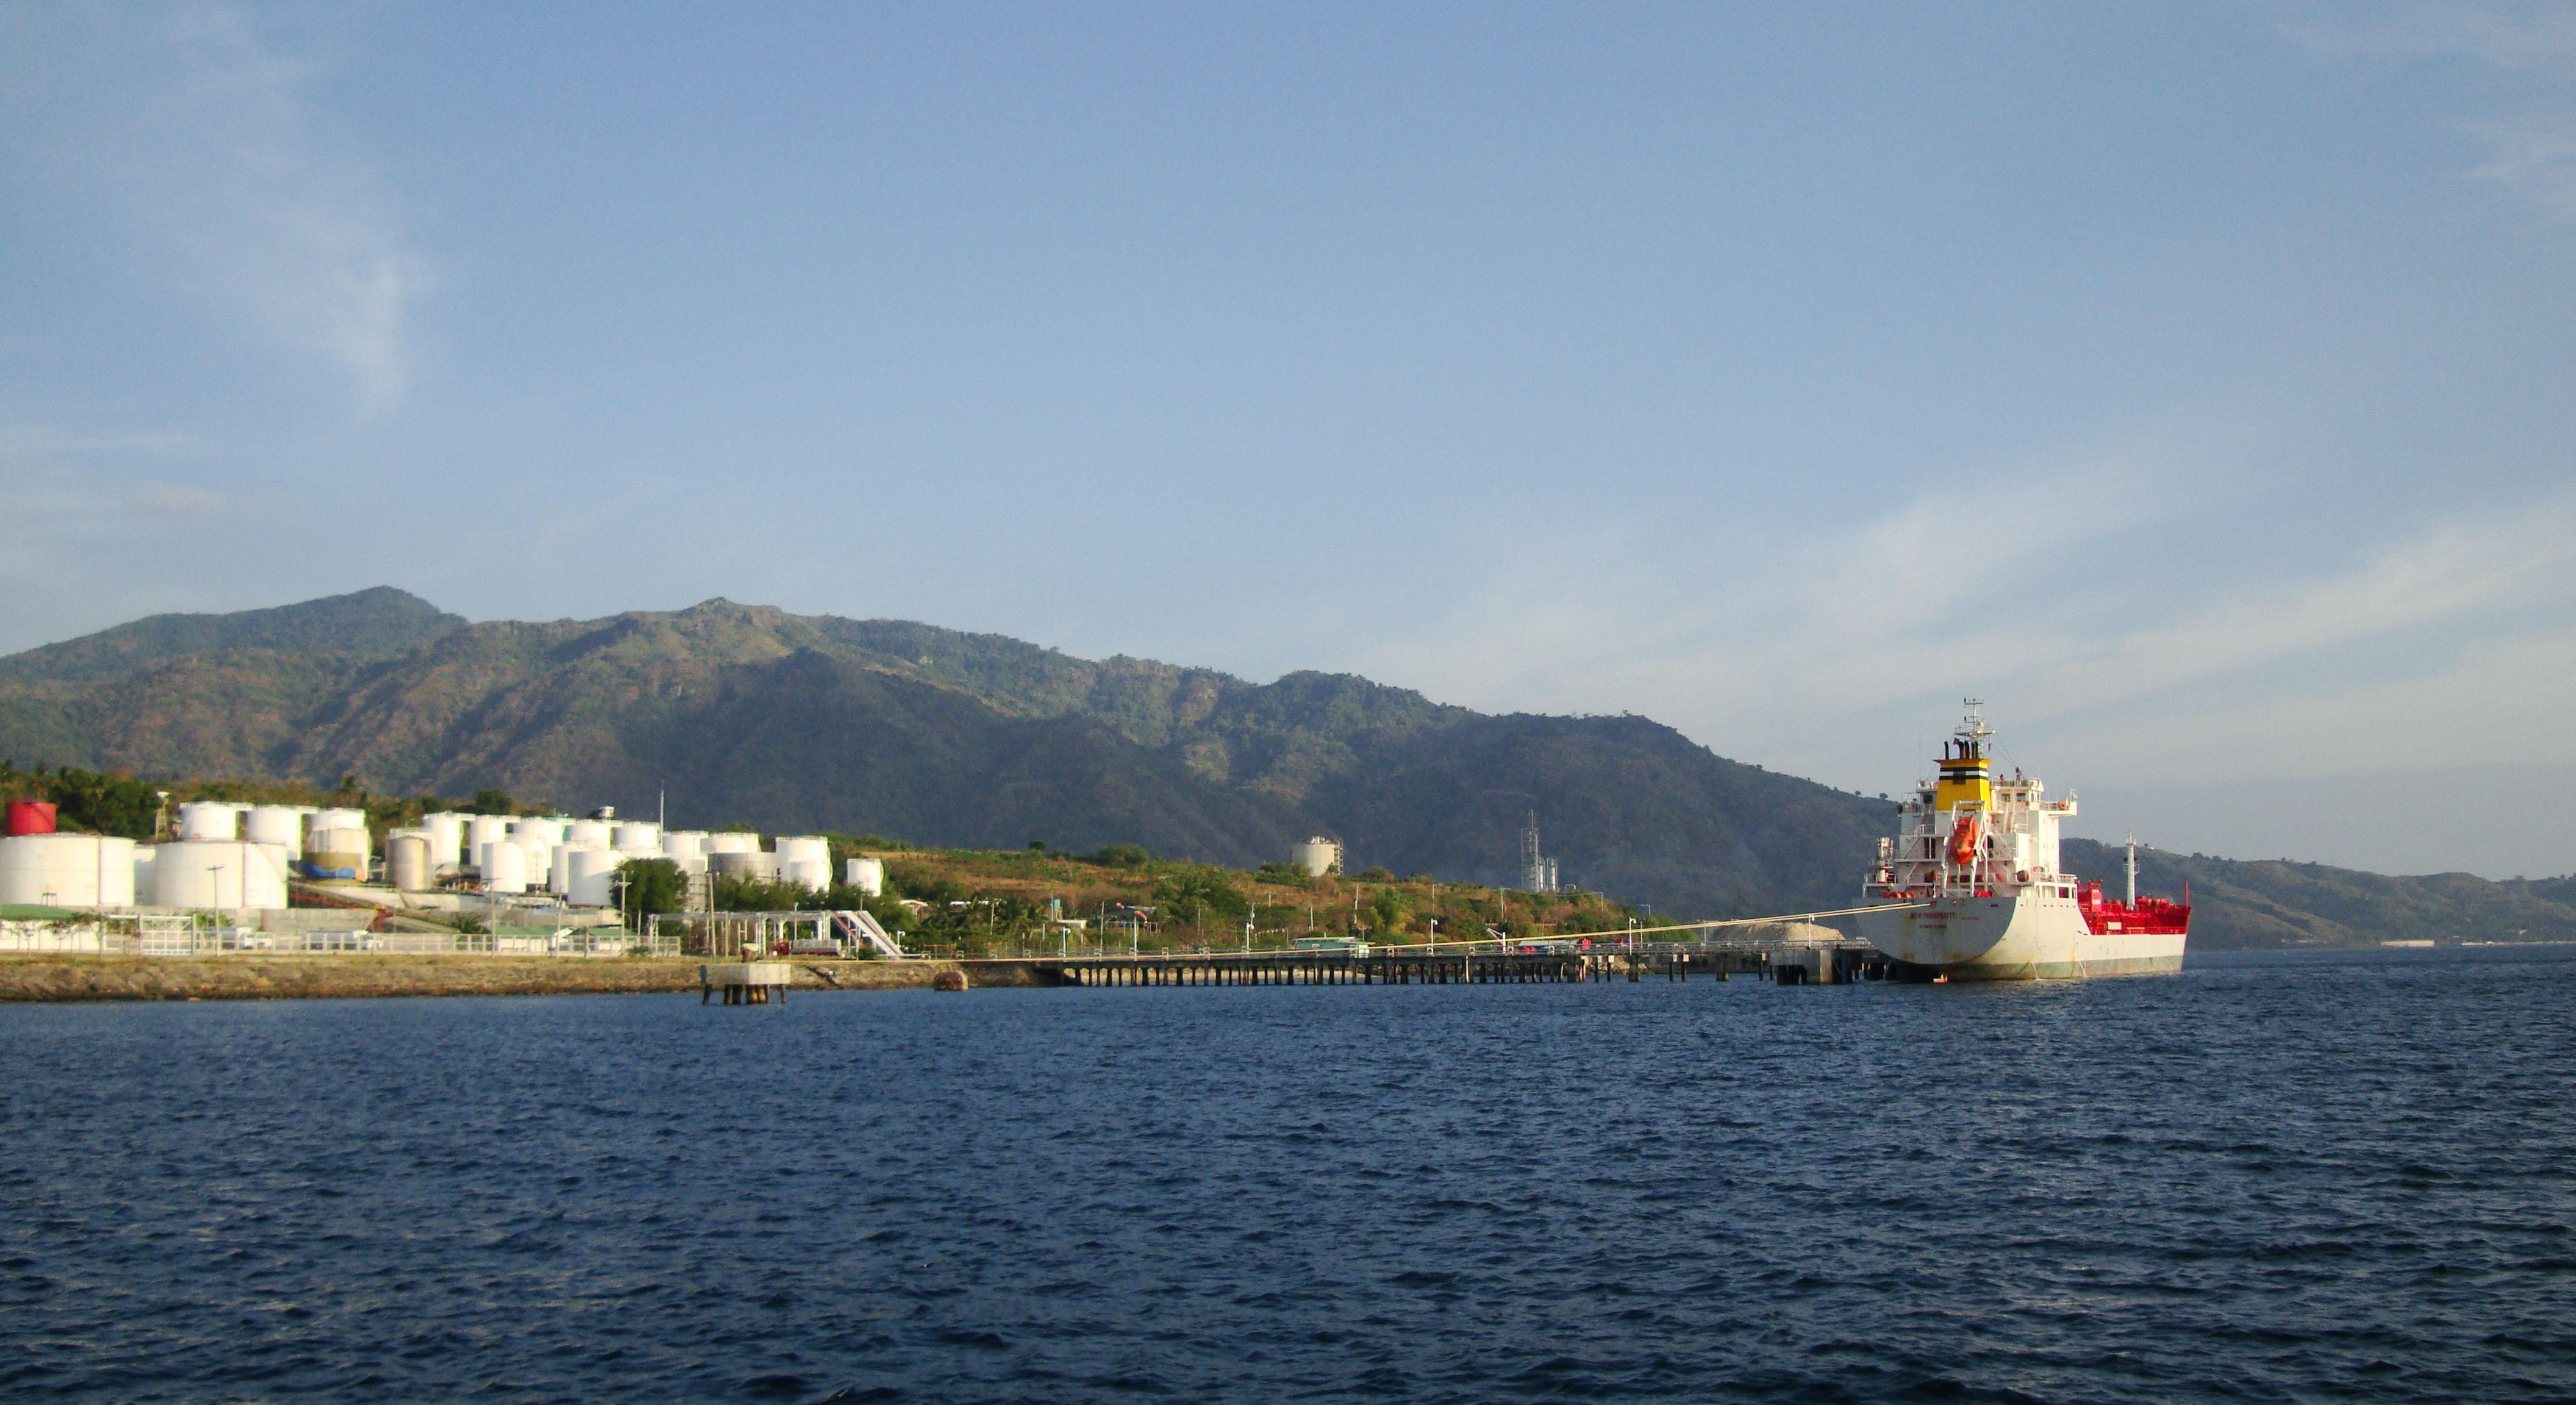 Hong Kong Merchant Vessel MV New Prosperity Batangus Bay Philippines 01